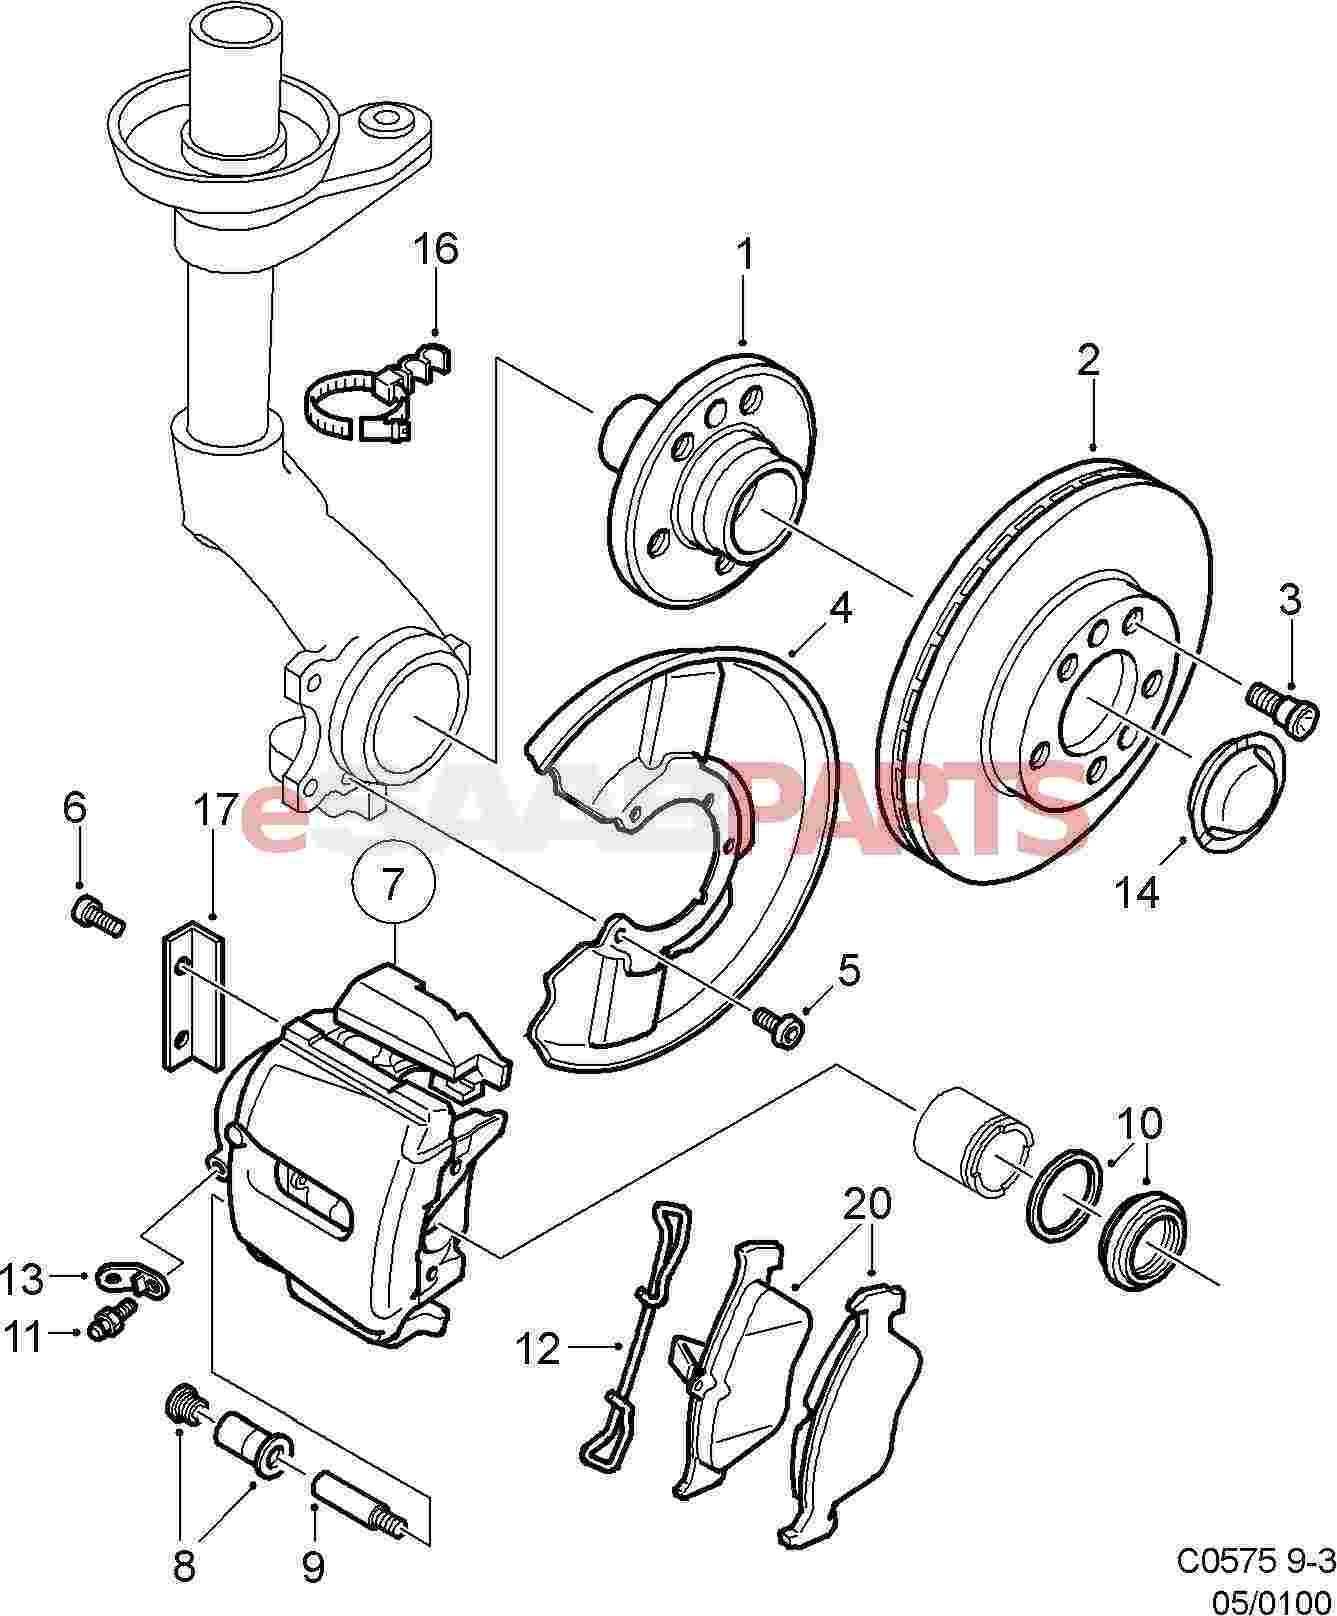 Brake Caliper Parts Diagram : brake, caliper, parts, diagram, ESaabParts.com, (9400), Brakes, Parts, Front, Front:, Brake, Disc/Caliper